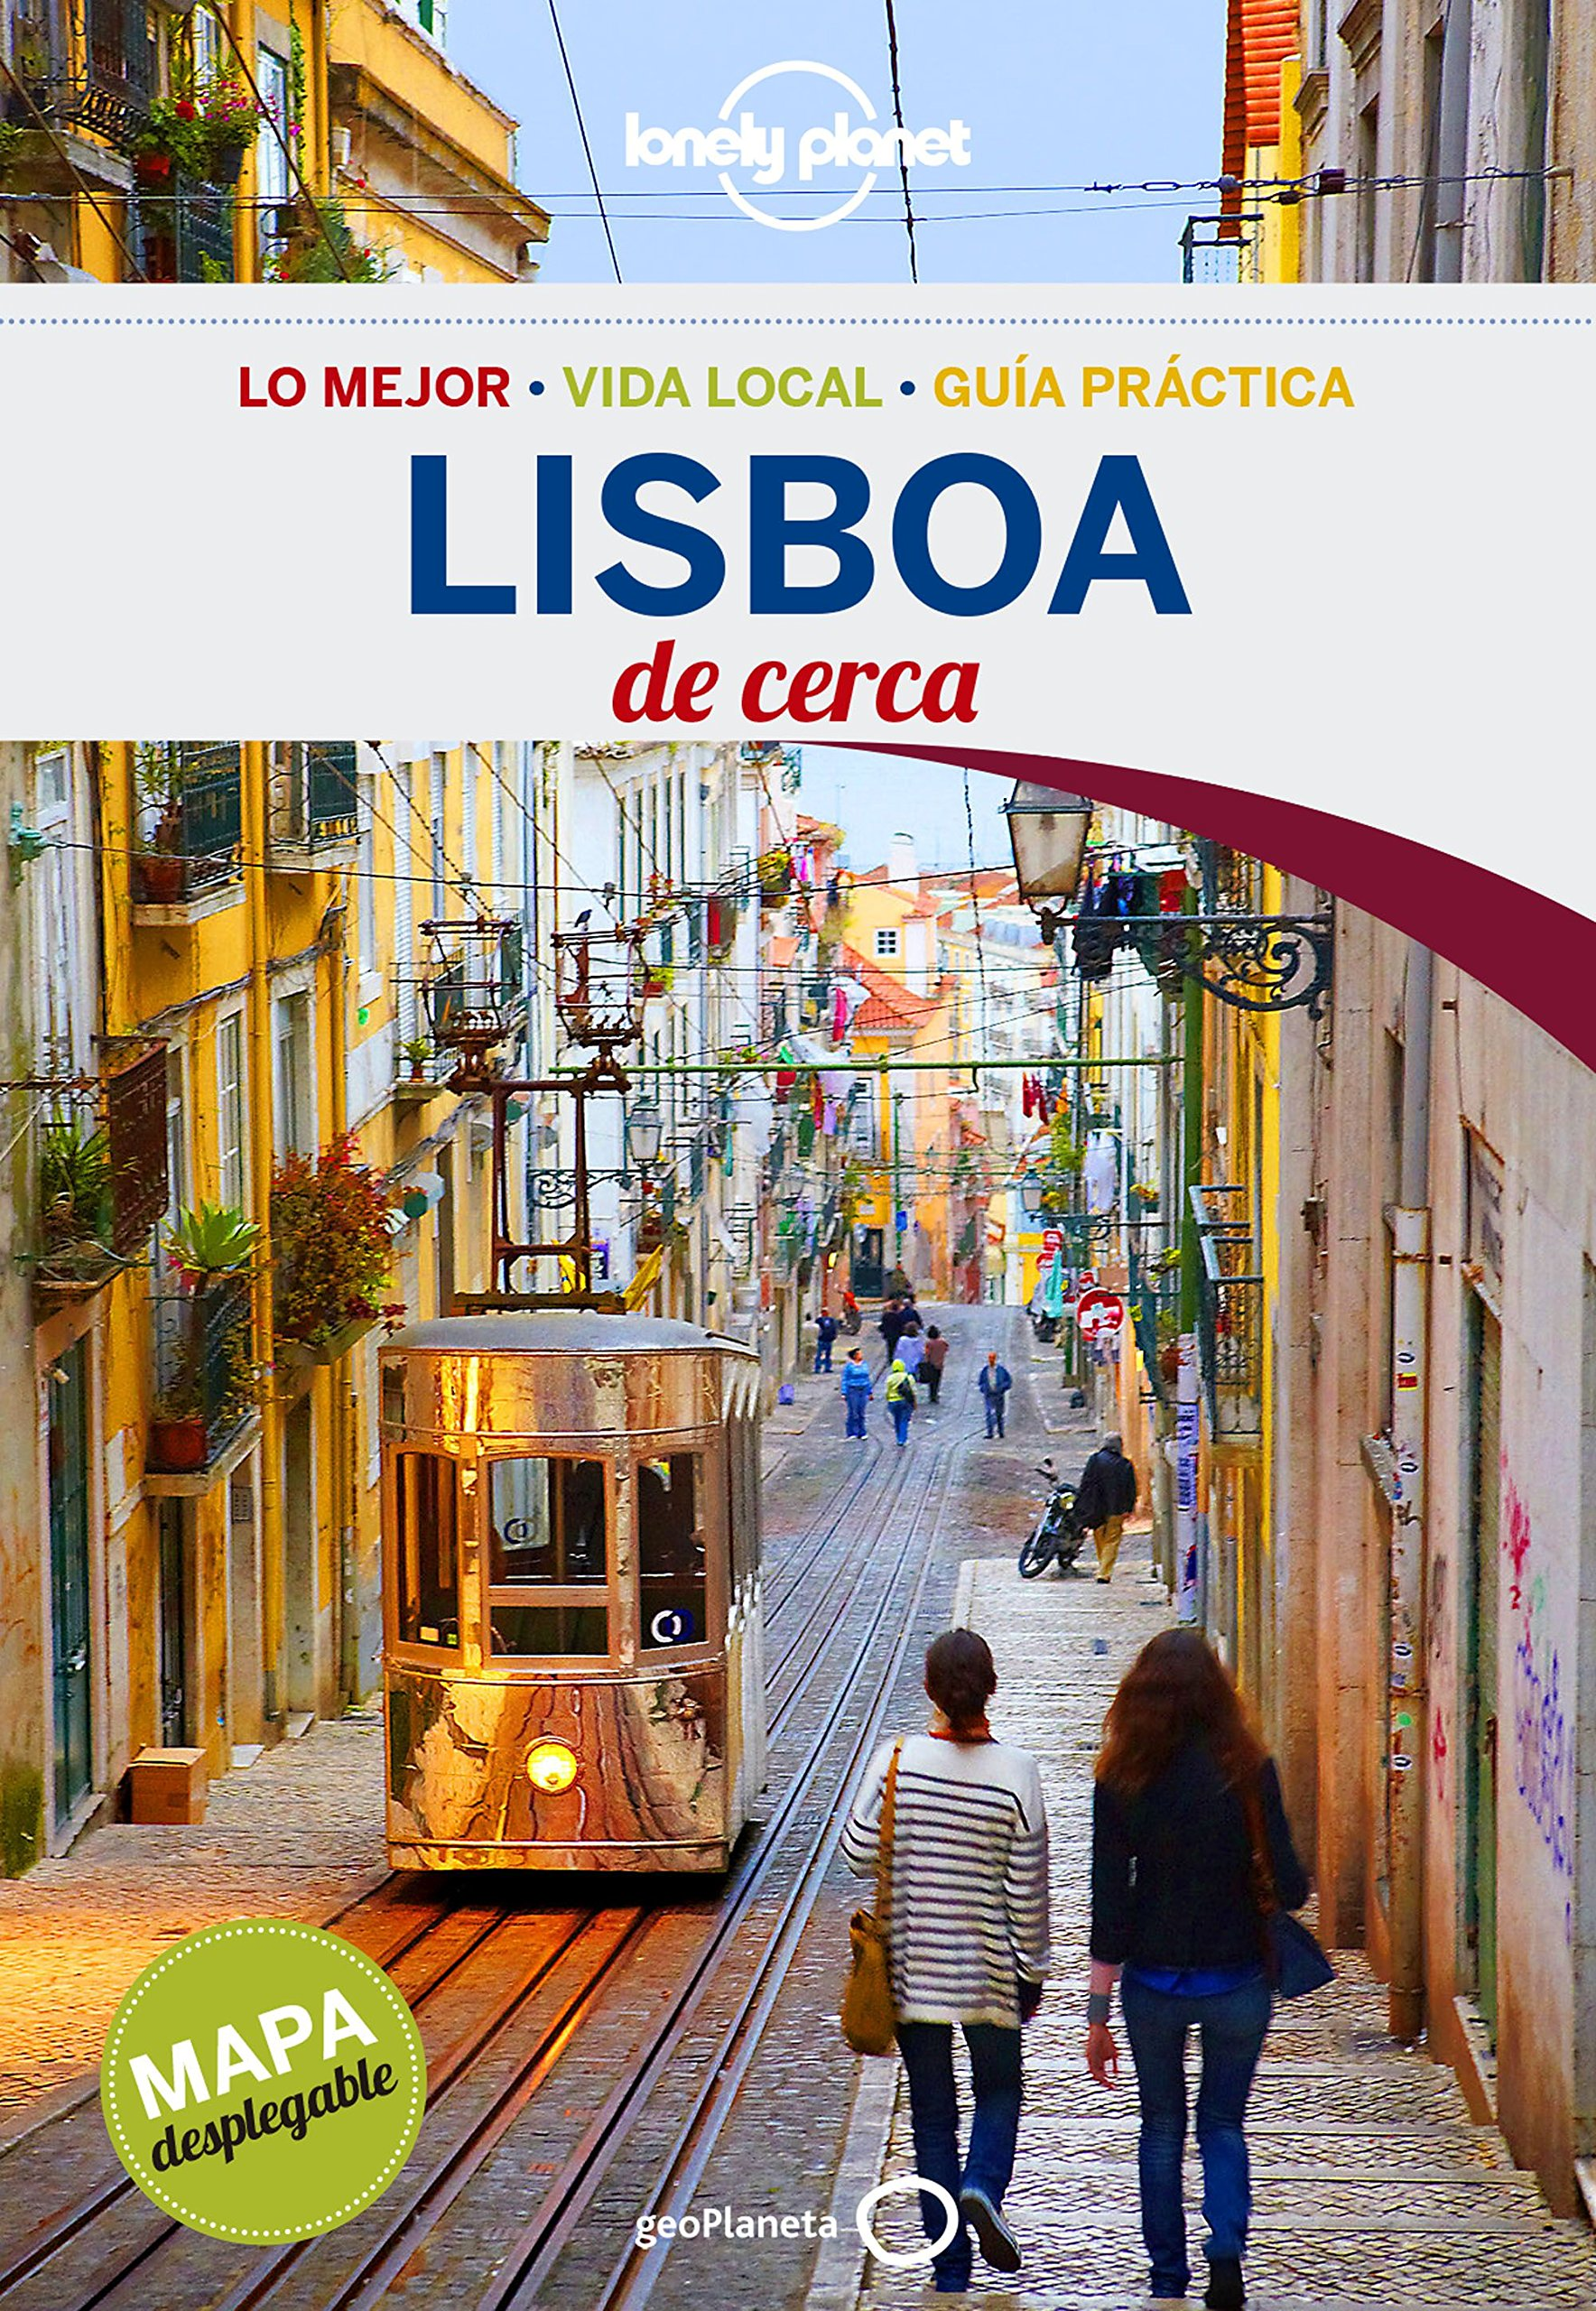 Lisboa De cerca 3 (Guías De cerca Lonely Planet) Tapa blanda – 12 ene 2016 Kerry Christiani Raquel García Ulldemolins GeoPlaneta 8408148389